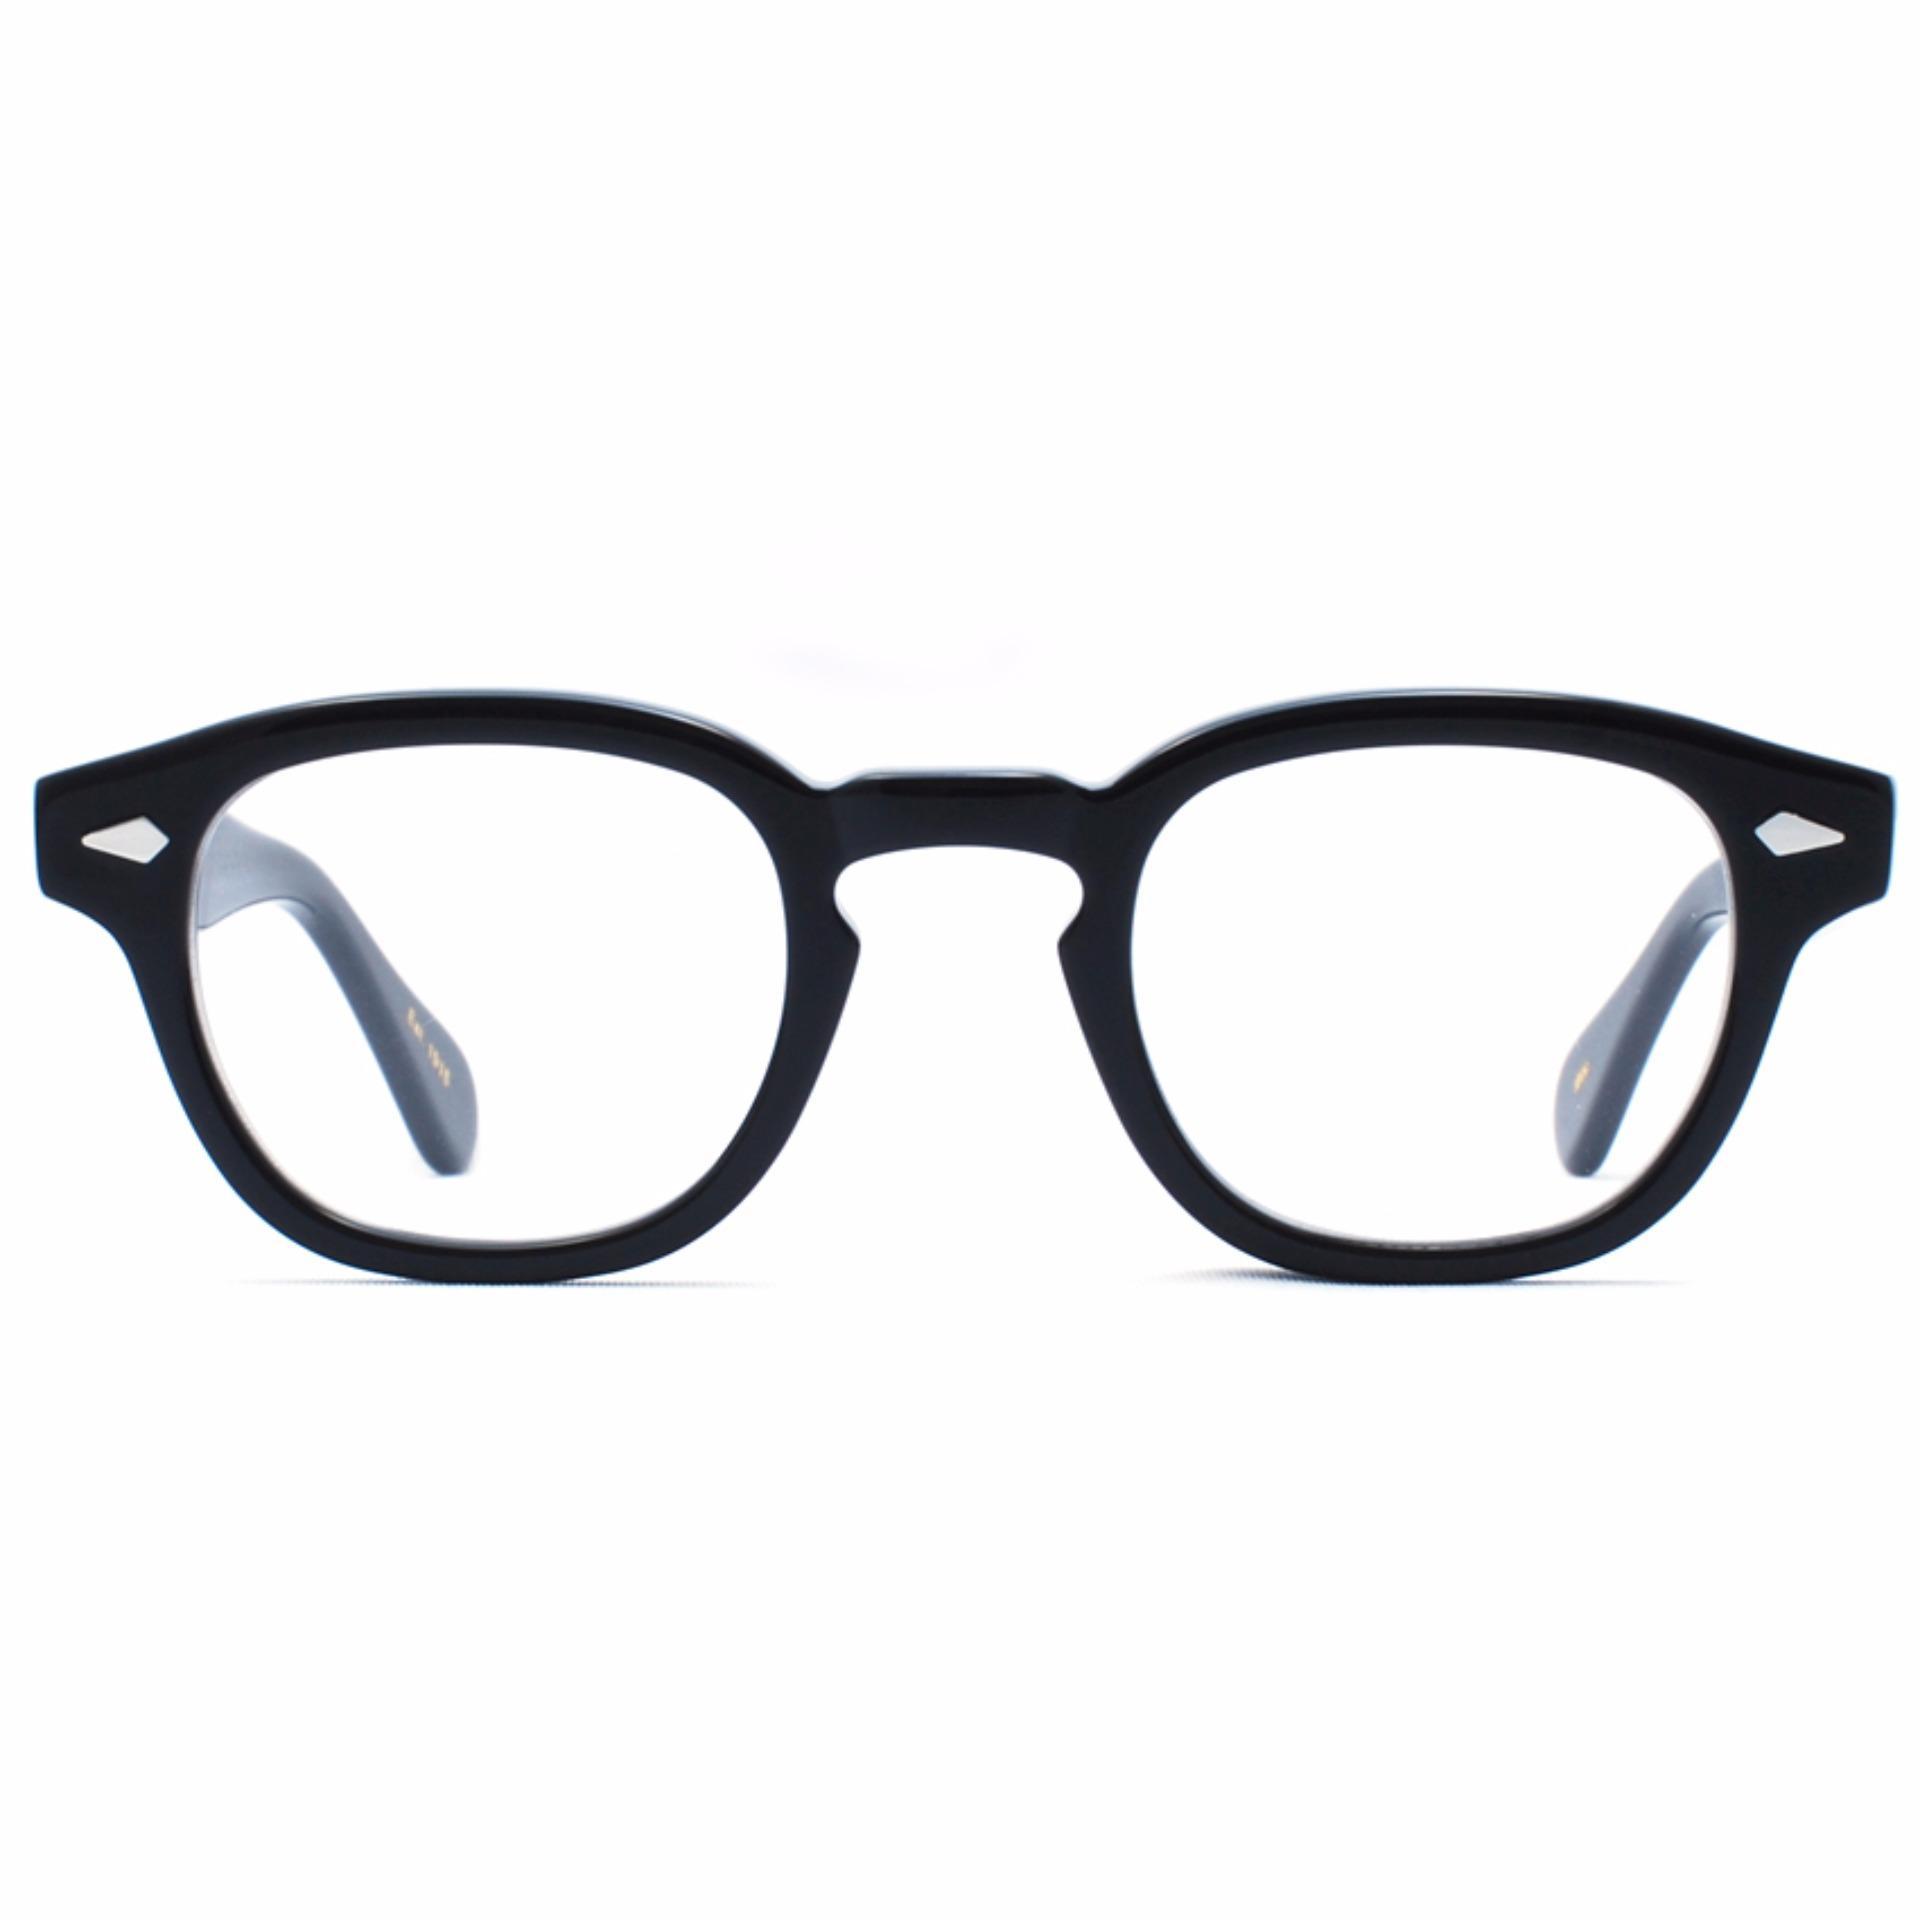 Frame Kacamata Pria Sporty Tr533 Hitam Bisa Dipasang Lensa